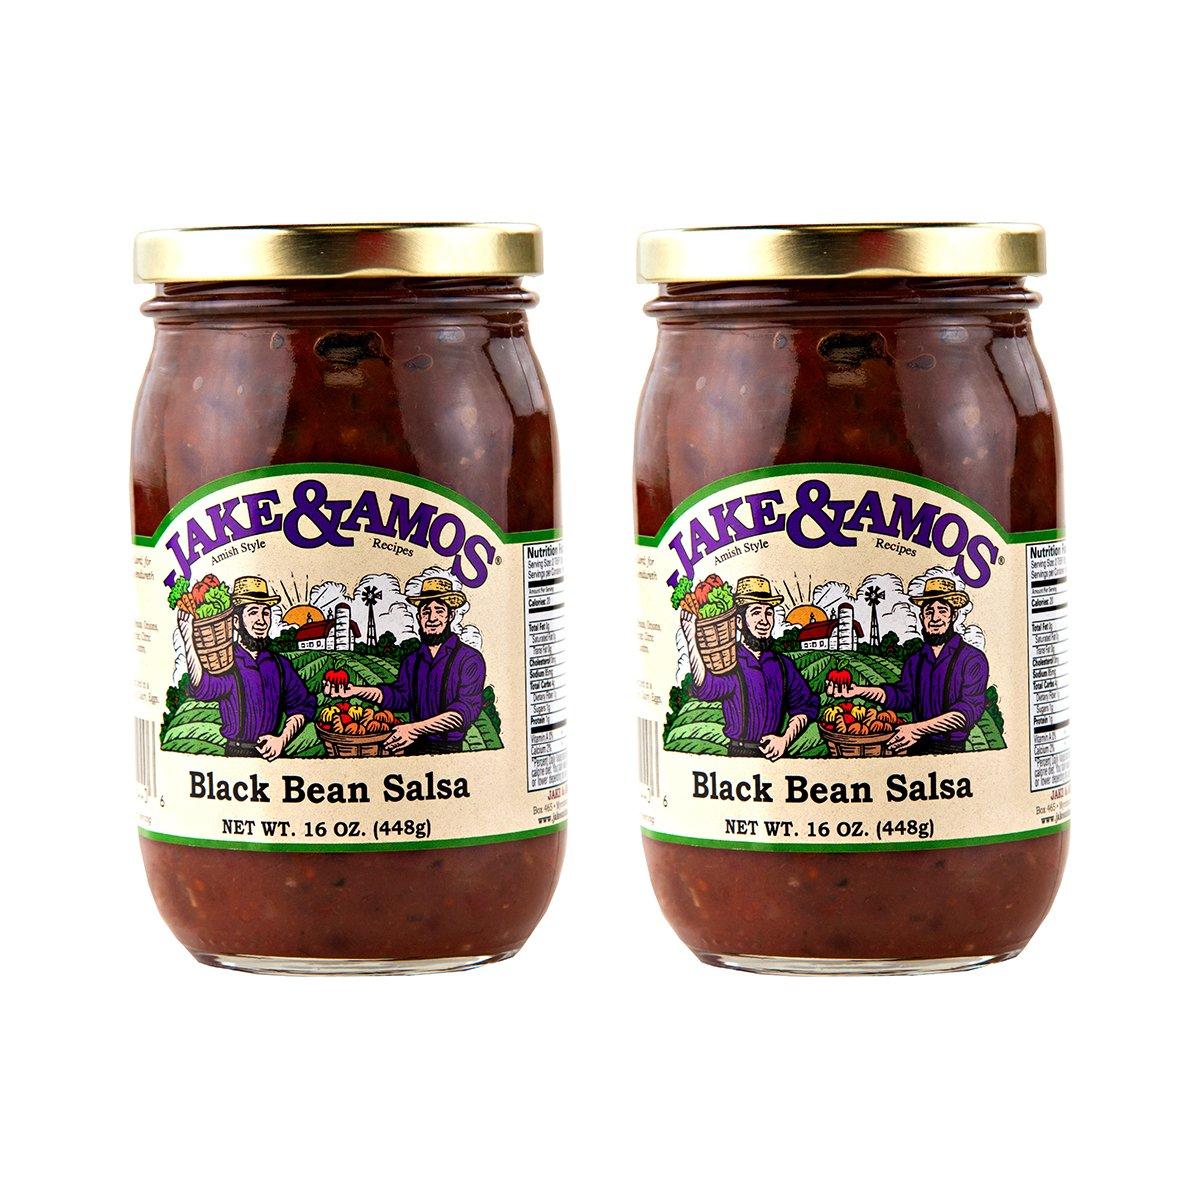 Jake & Amos Black Bean Salsa / 2 - 16 Oz. Jars by Jake & Amos